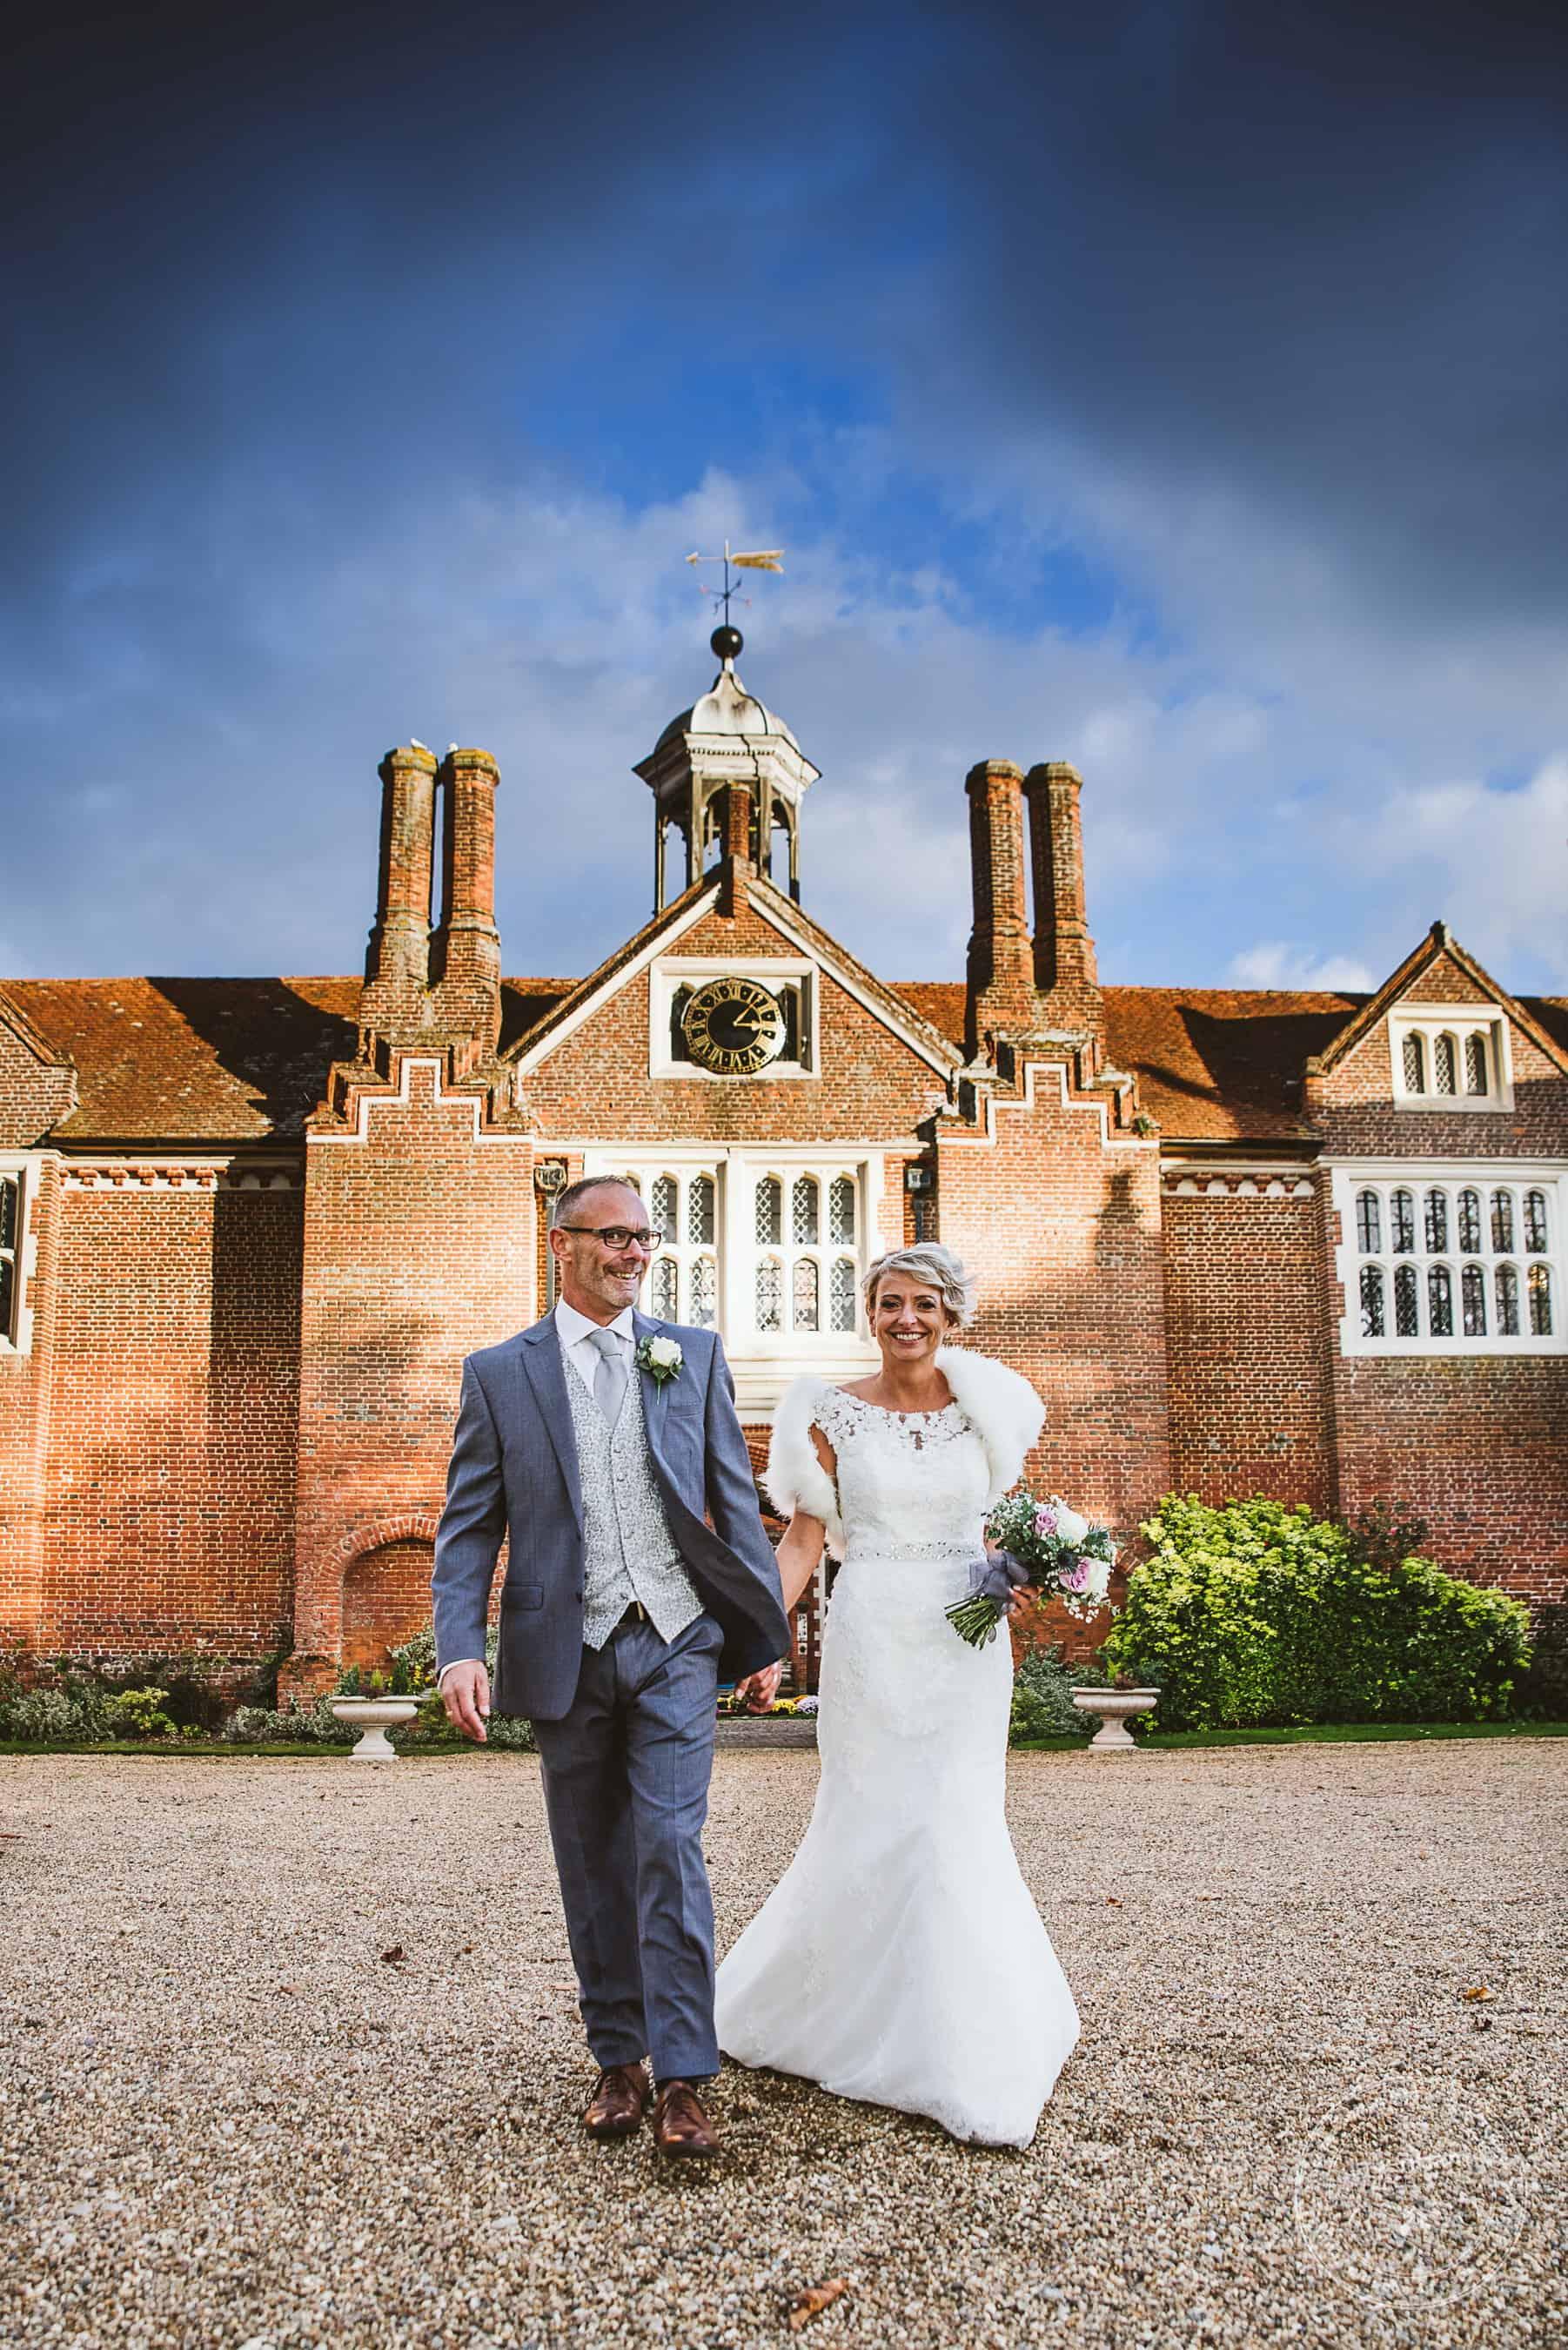 281018 Gosfield Hall Wedding Photography Lavenham Photographic 085